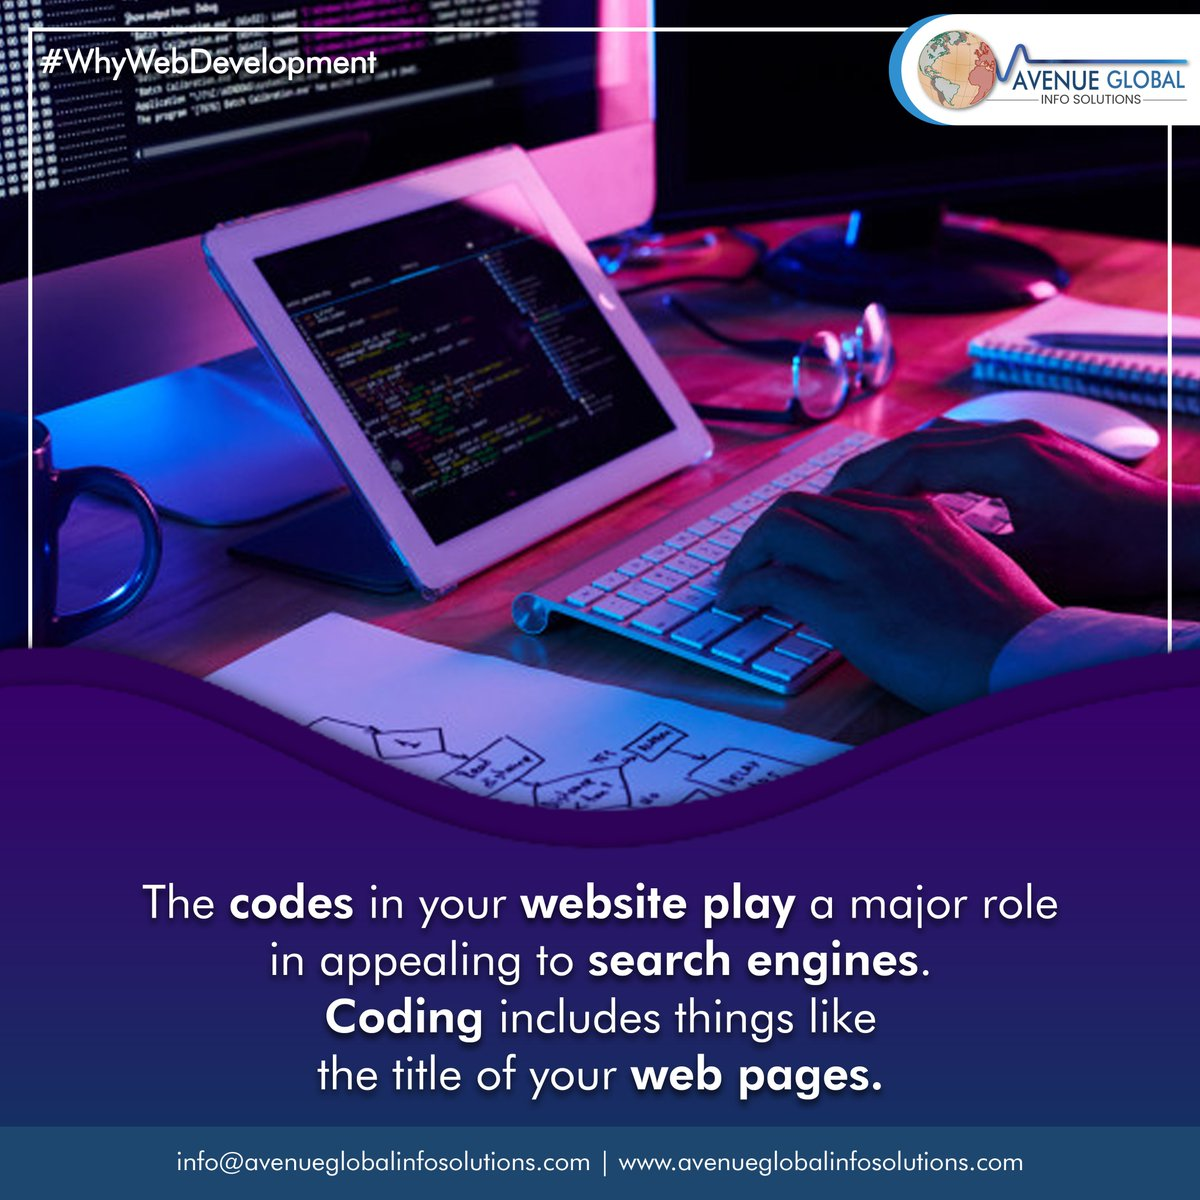 """Codes In Your Websites Play a Major Role in Search Engines!  #whywebdevelopment #webdesigncompany #websitedeveloper #webdesigntips #instatech #instatechno #socialmediamarketing #Avenueglobalinfosolutions #avenueglobal #AGIS #Webdesigning #Digitalmarketing #Websitedevelopmentpic.twitter.com/zNdLJKJf5c"